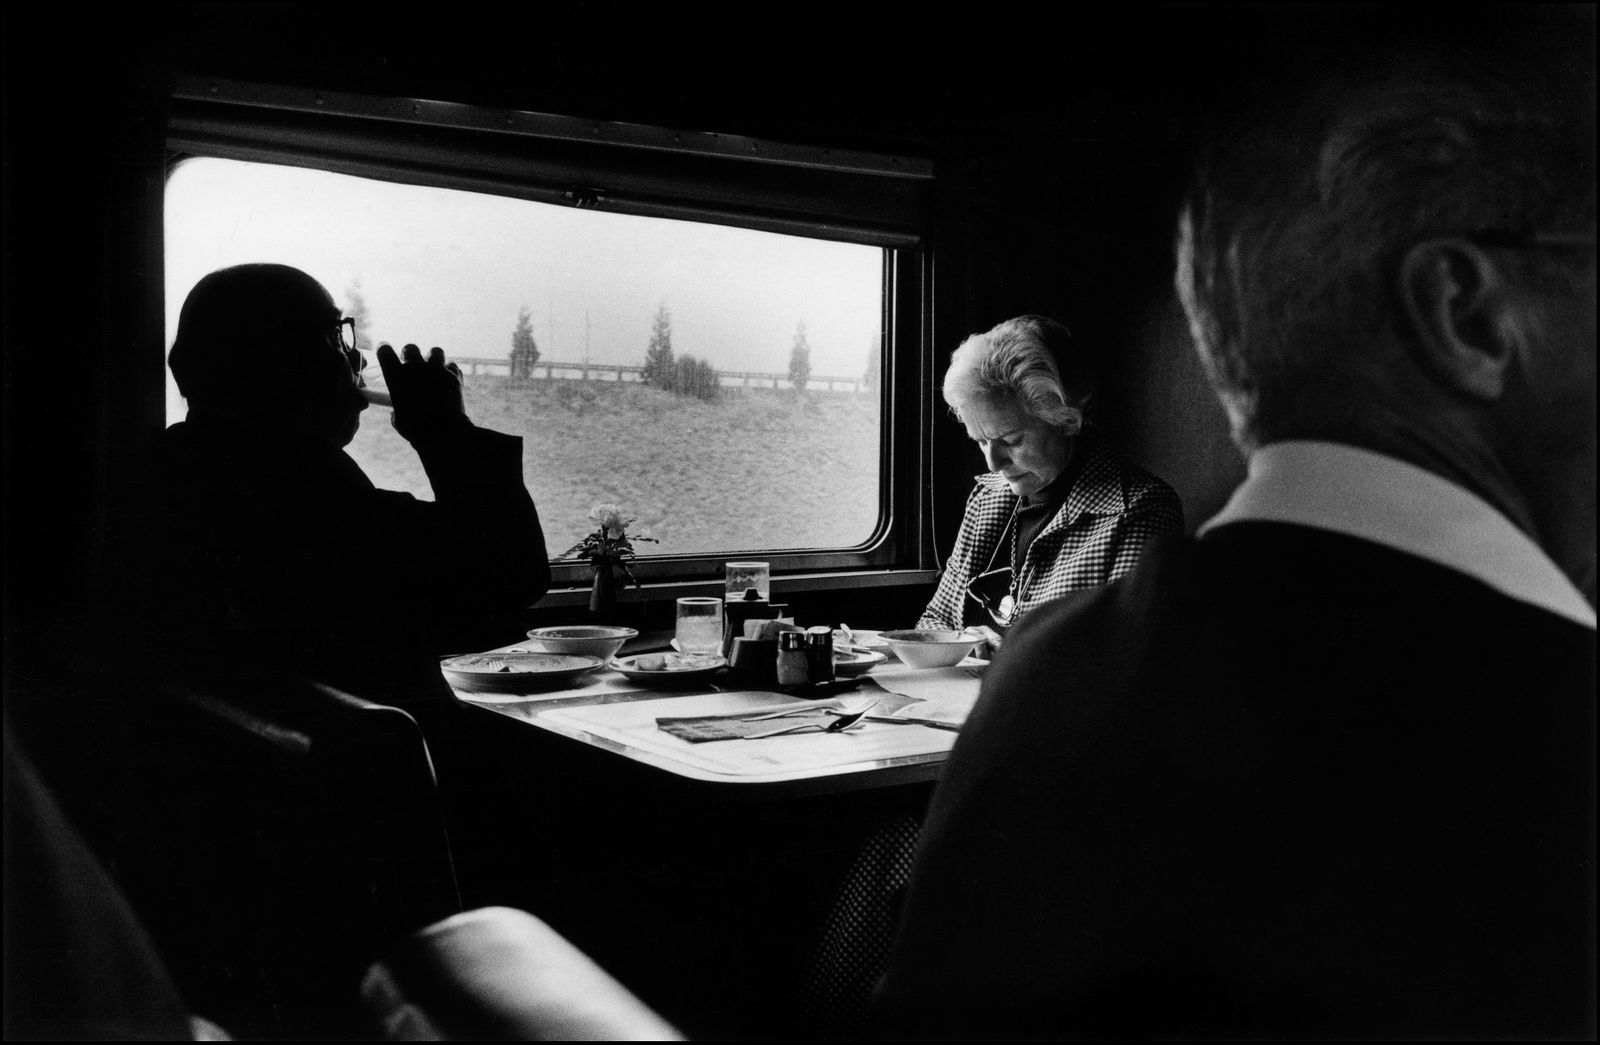 Amtrak_EugenetoSeattle_1979.jpg